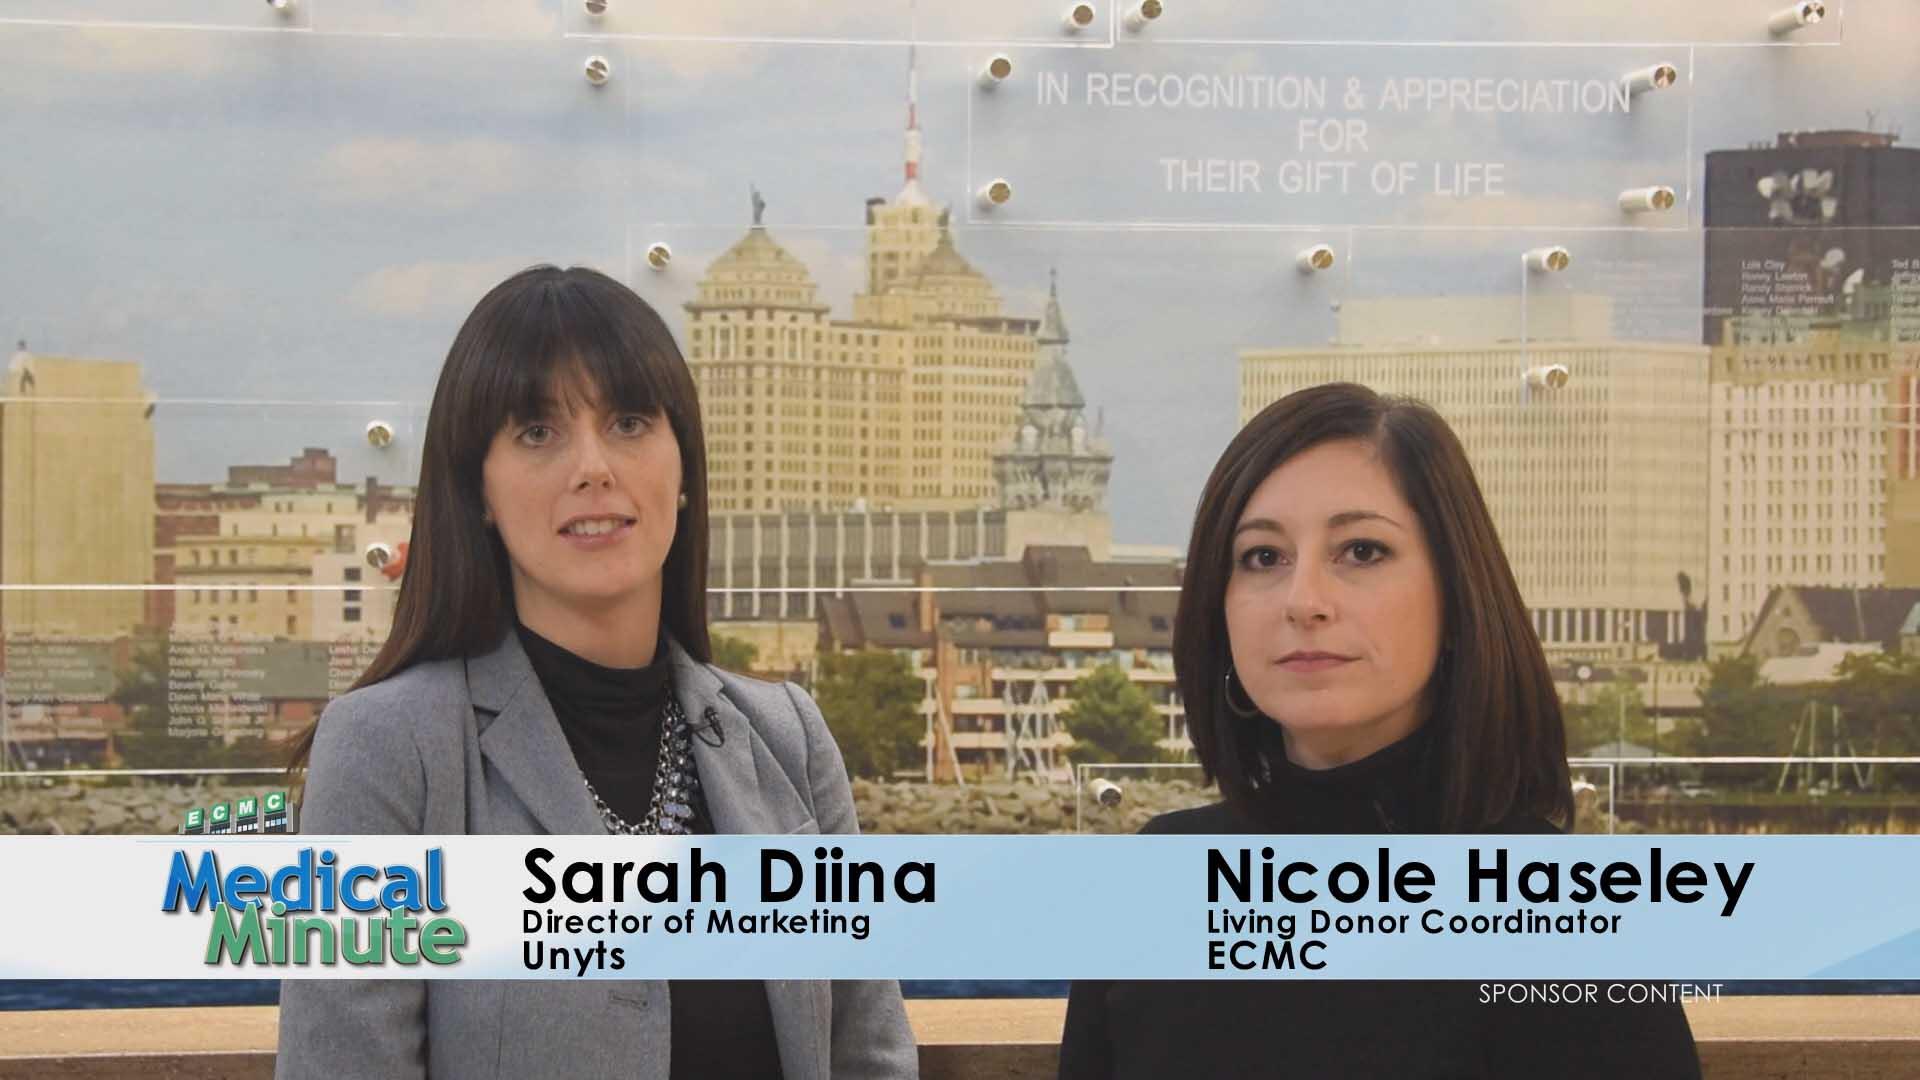 ECMCMedicalMinute Sarah&Nicole DonateLifeMonth 04.03.17